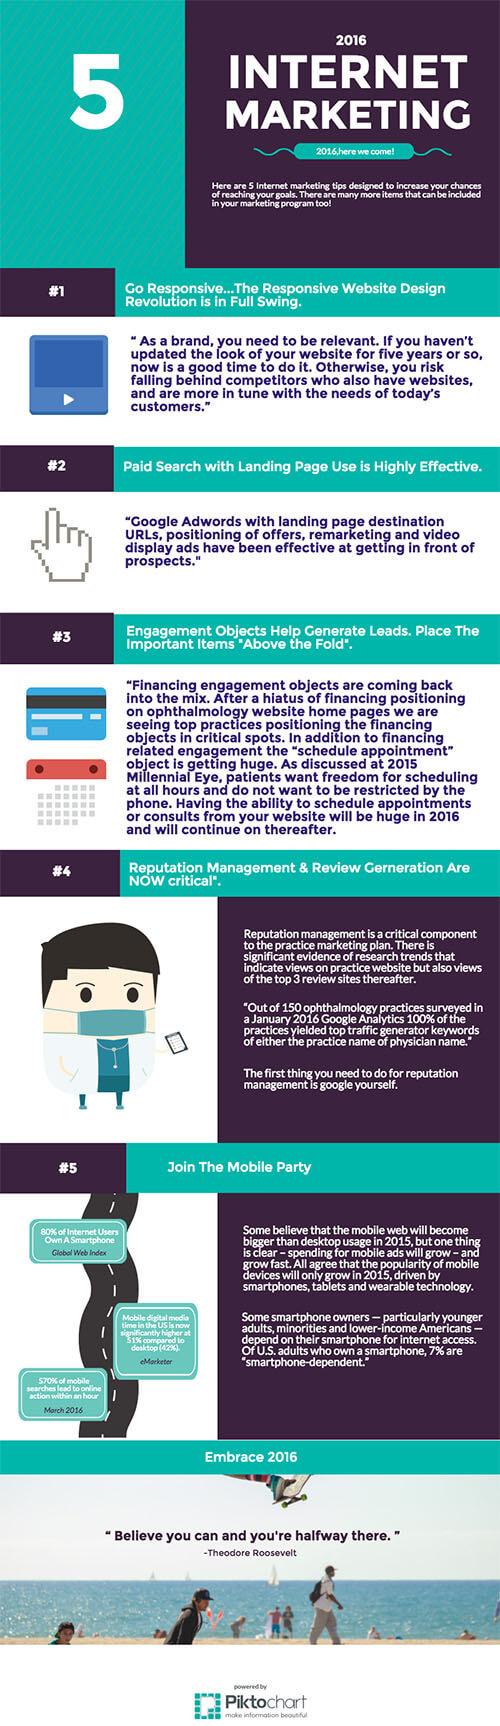 Internet Marketing Trends Infographic